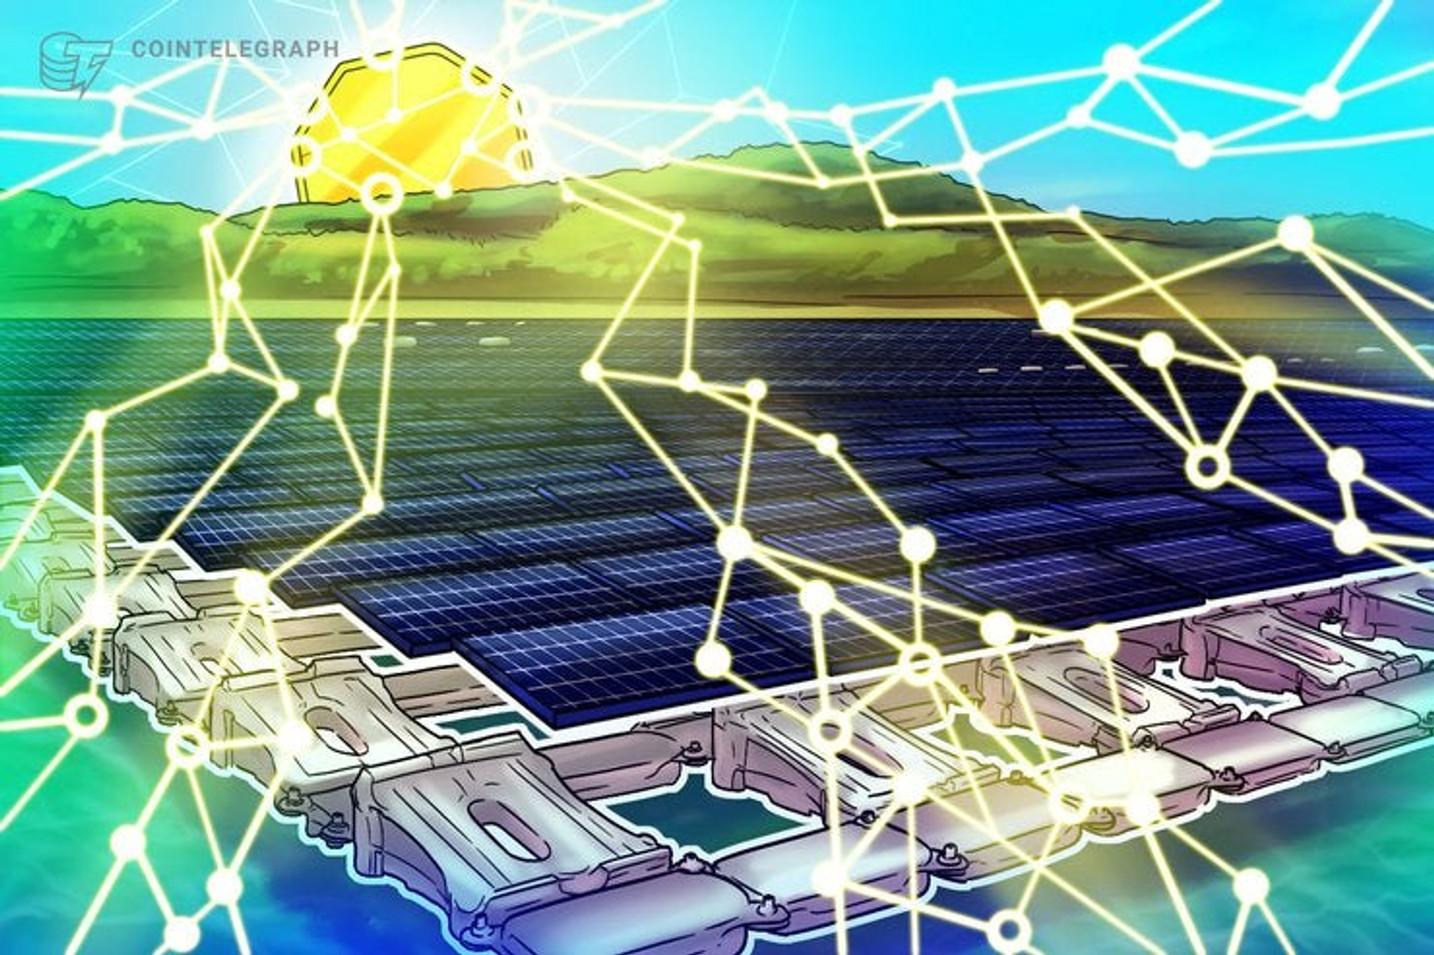 Proyecto EKATE desarrollará sistemas de intercambio energético con blockchain e IoT